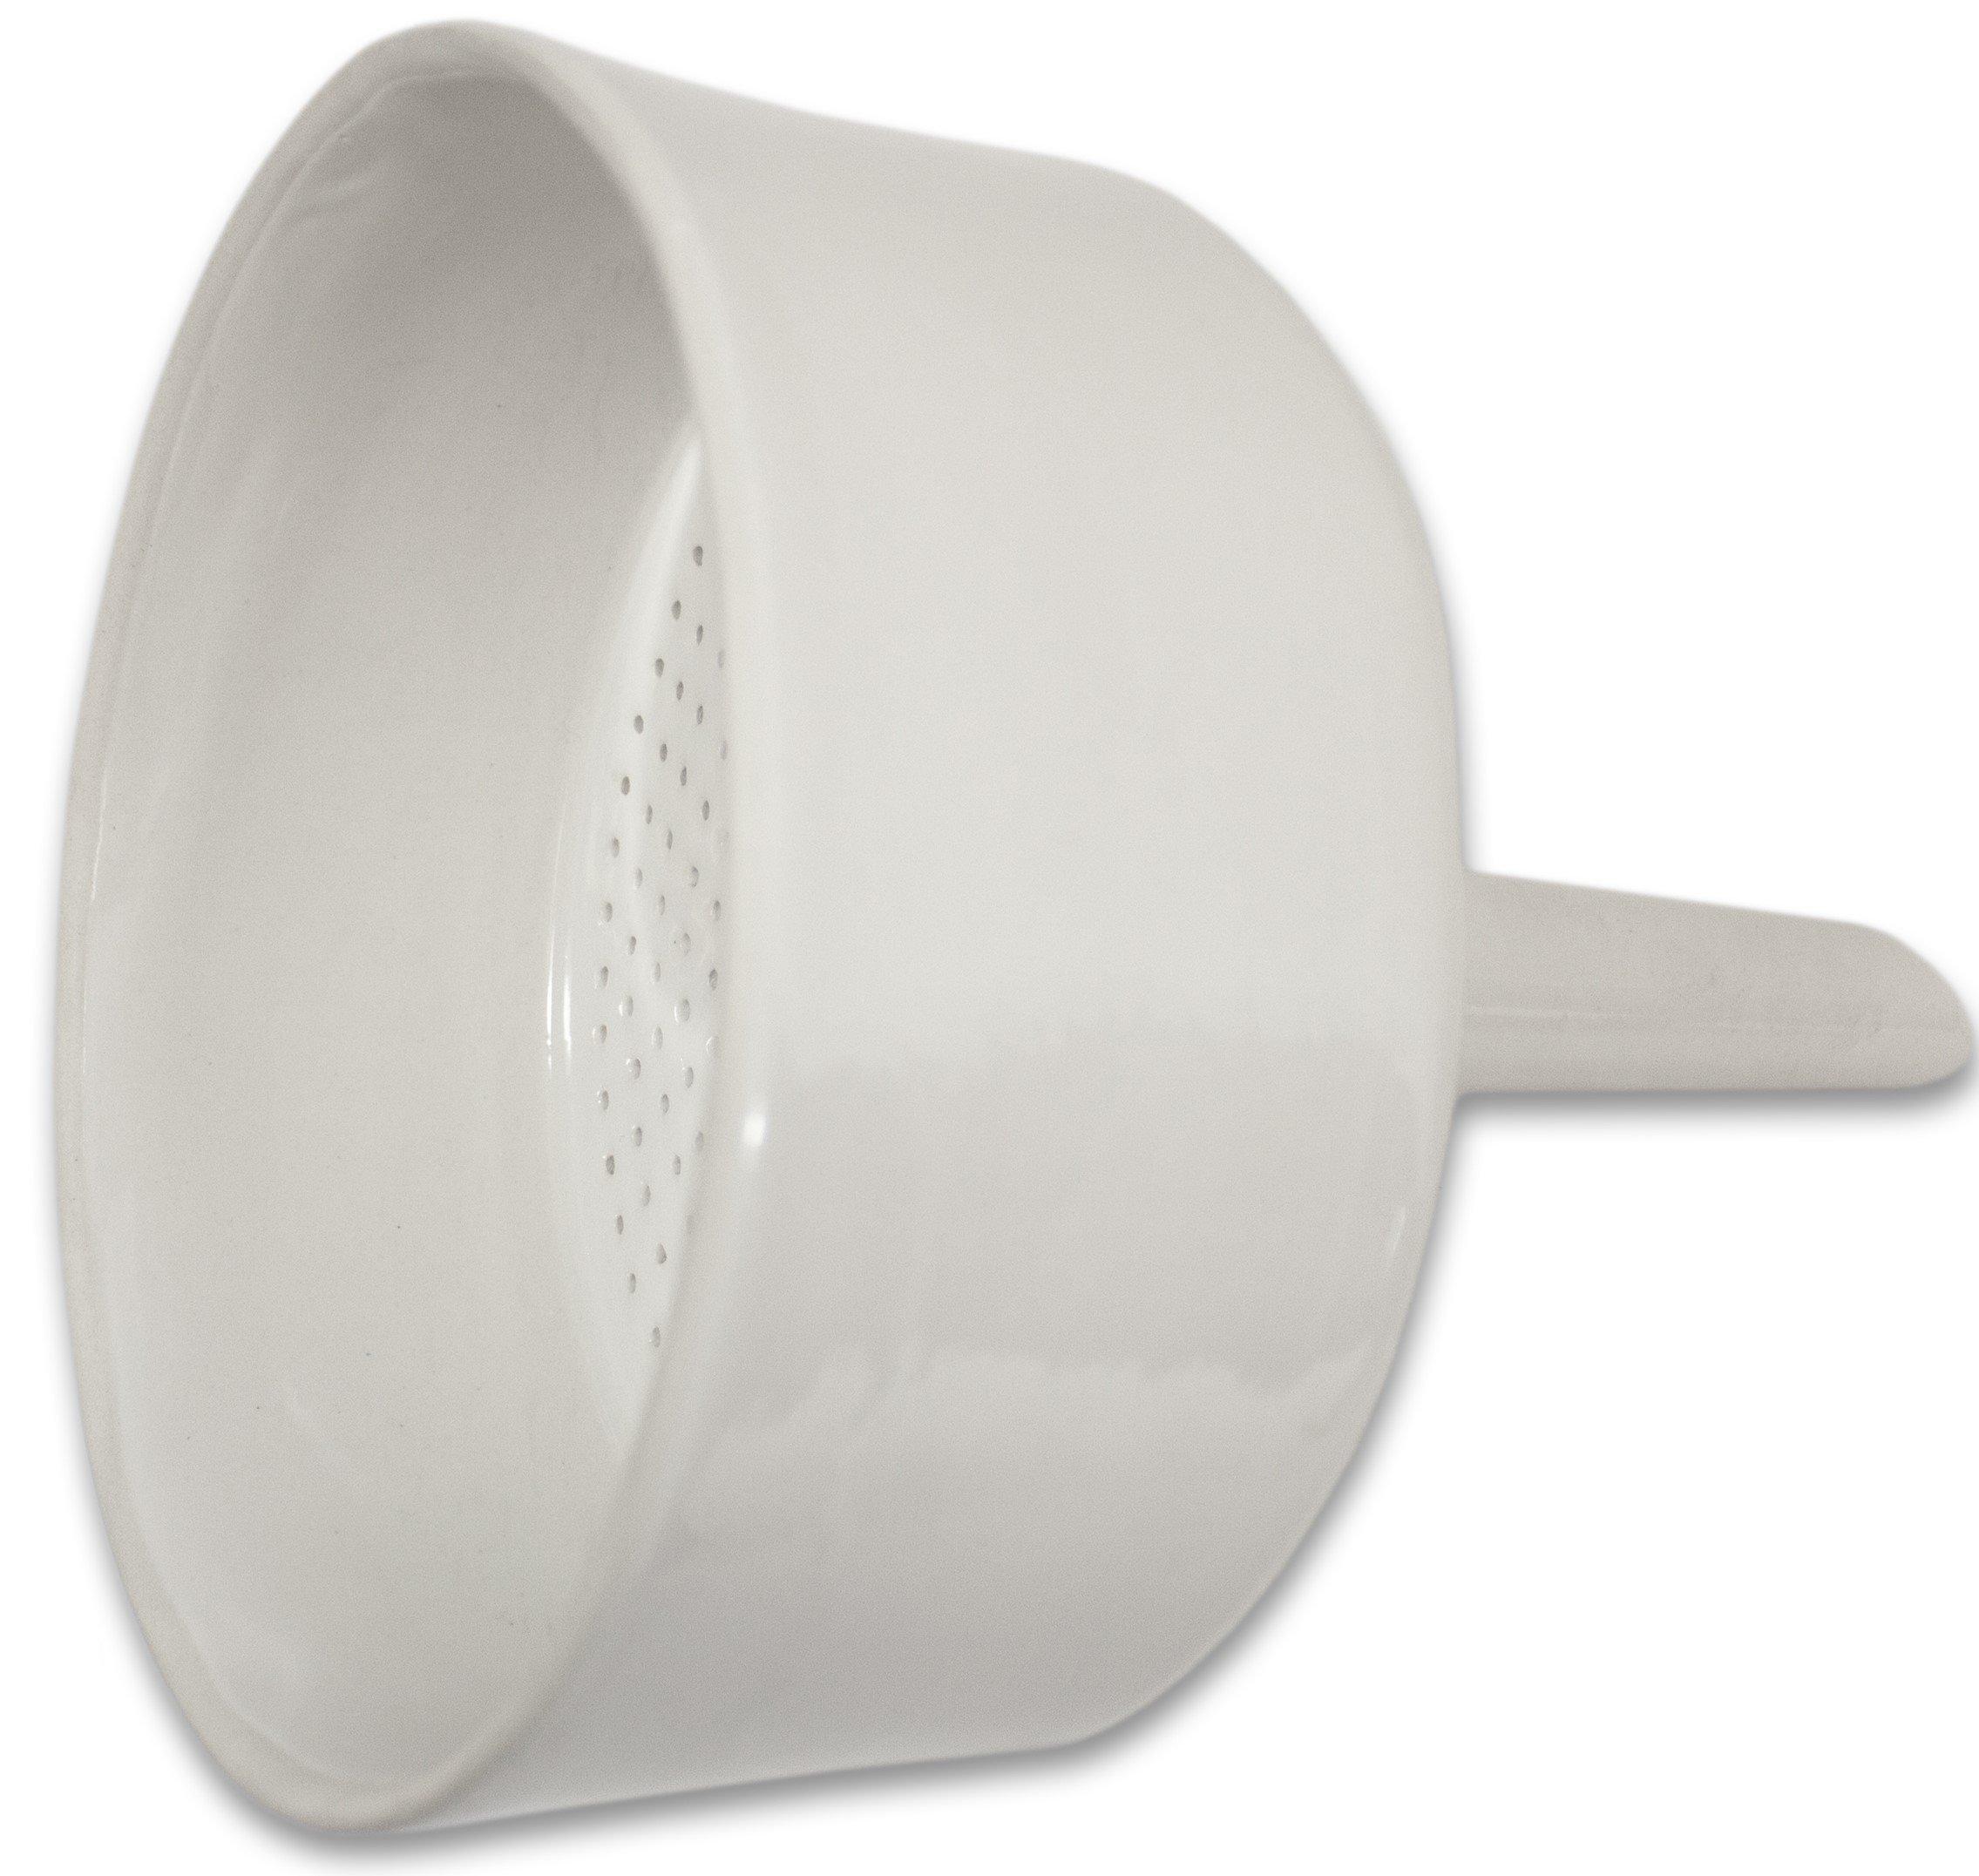 Sterlitech Corporation Buchner Funnel, Porcelain, Capacity 800ML, Paper Size 125 mm